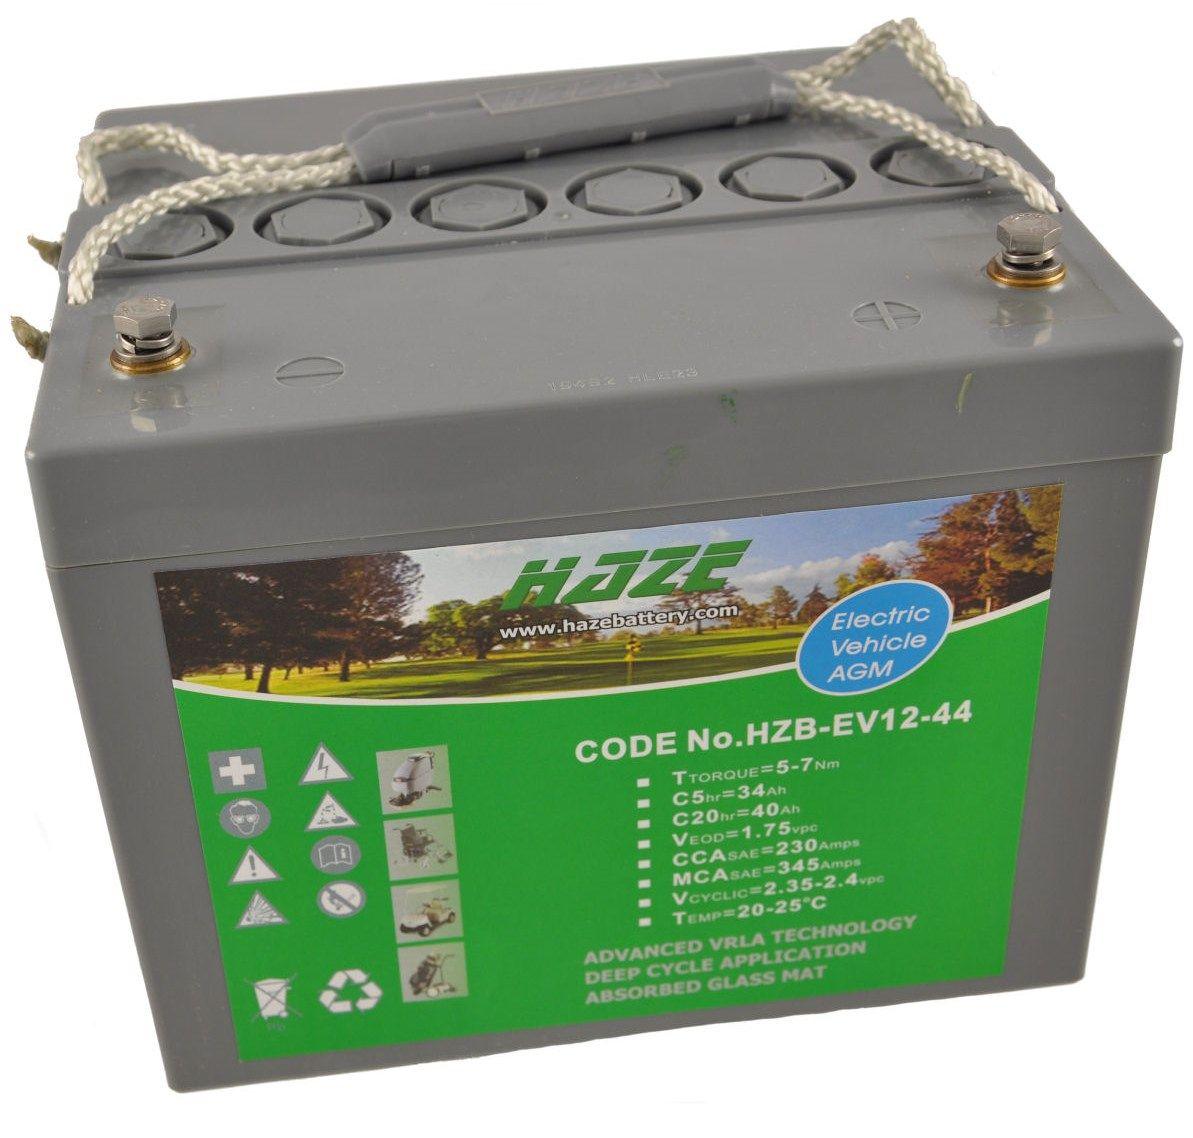 12V 46Ah Haze Sealed Lead Acid (AGM) Mobility Scooter Battery